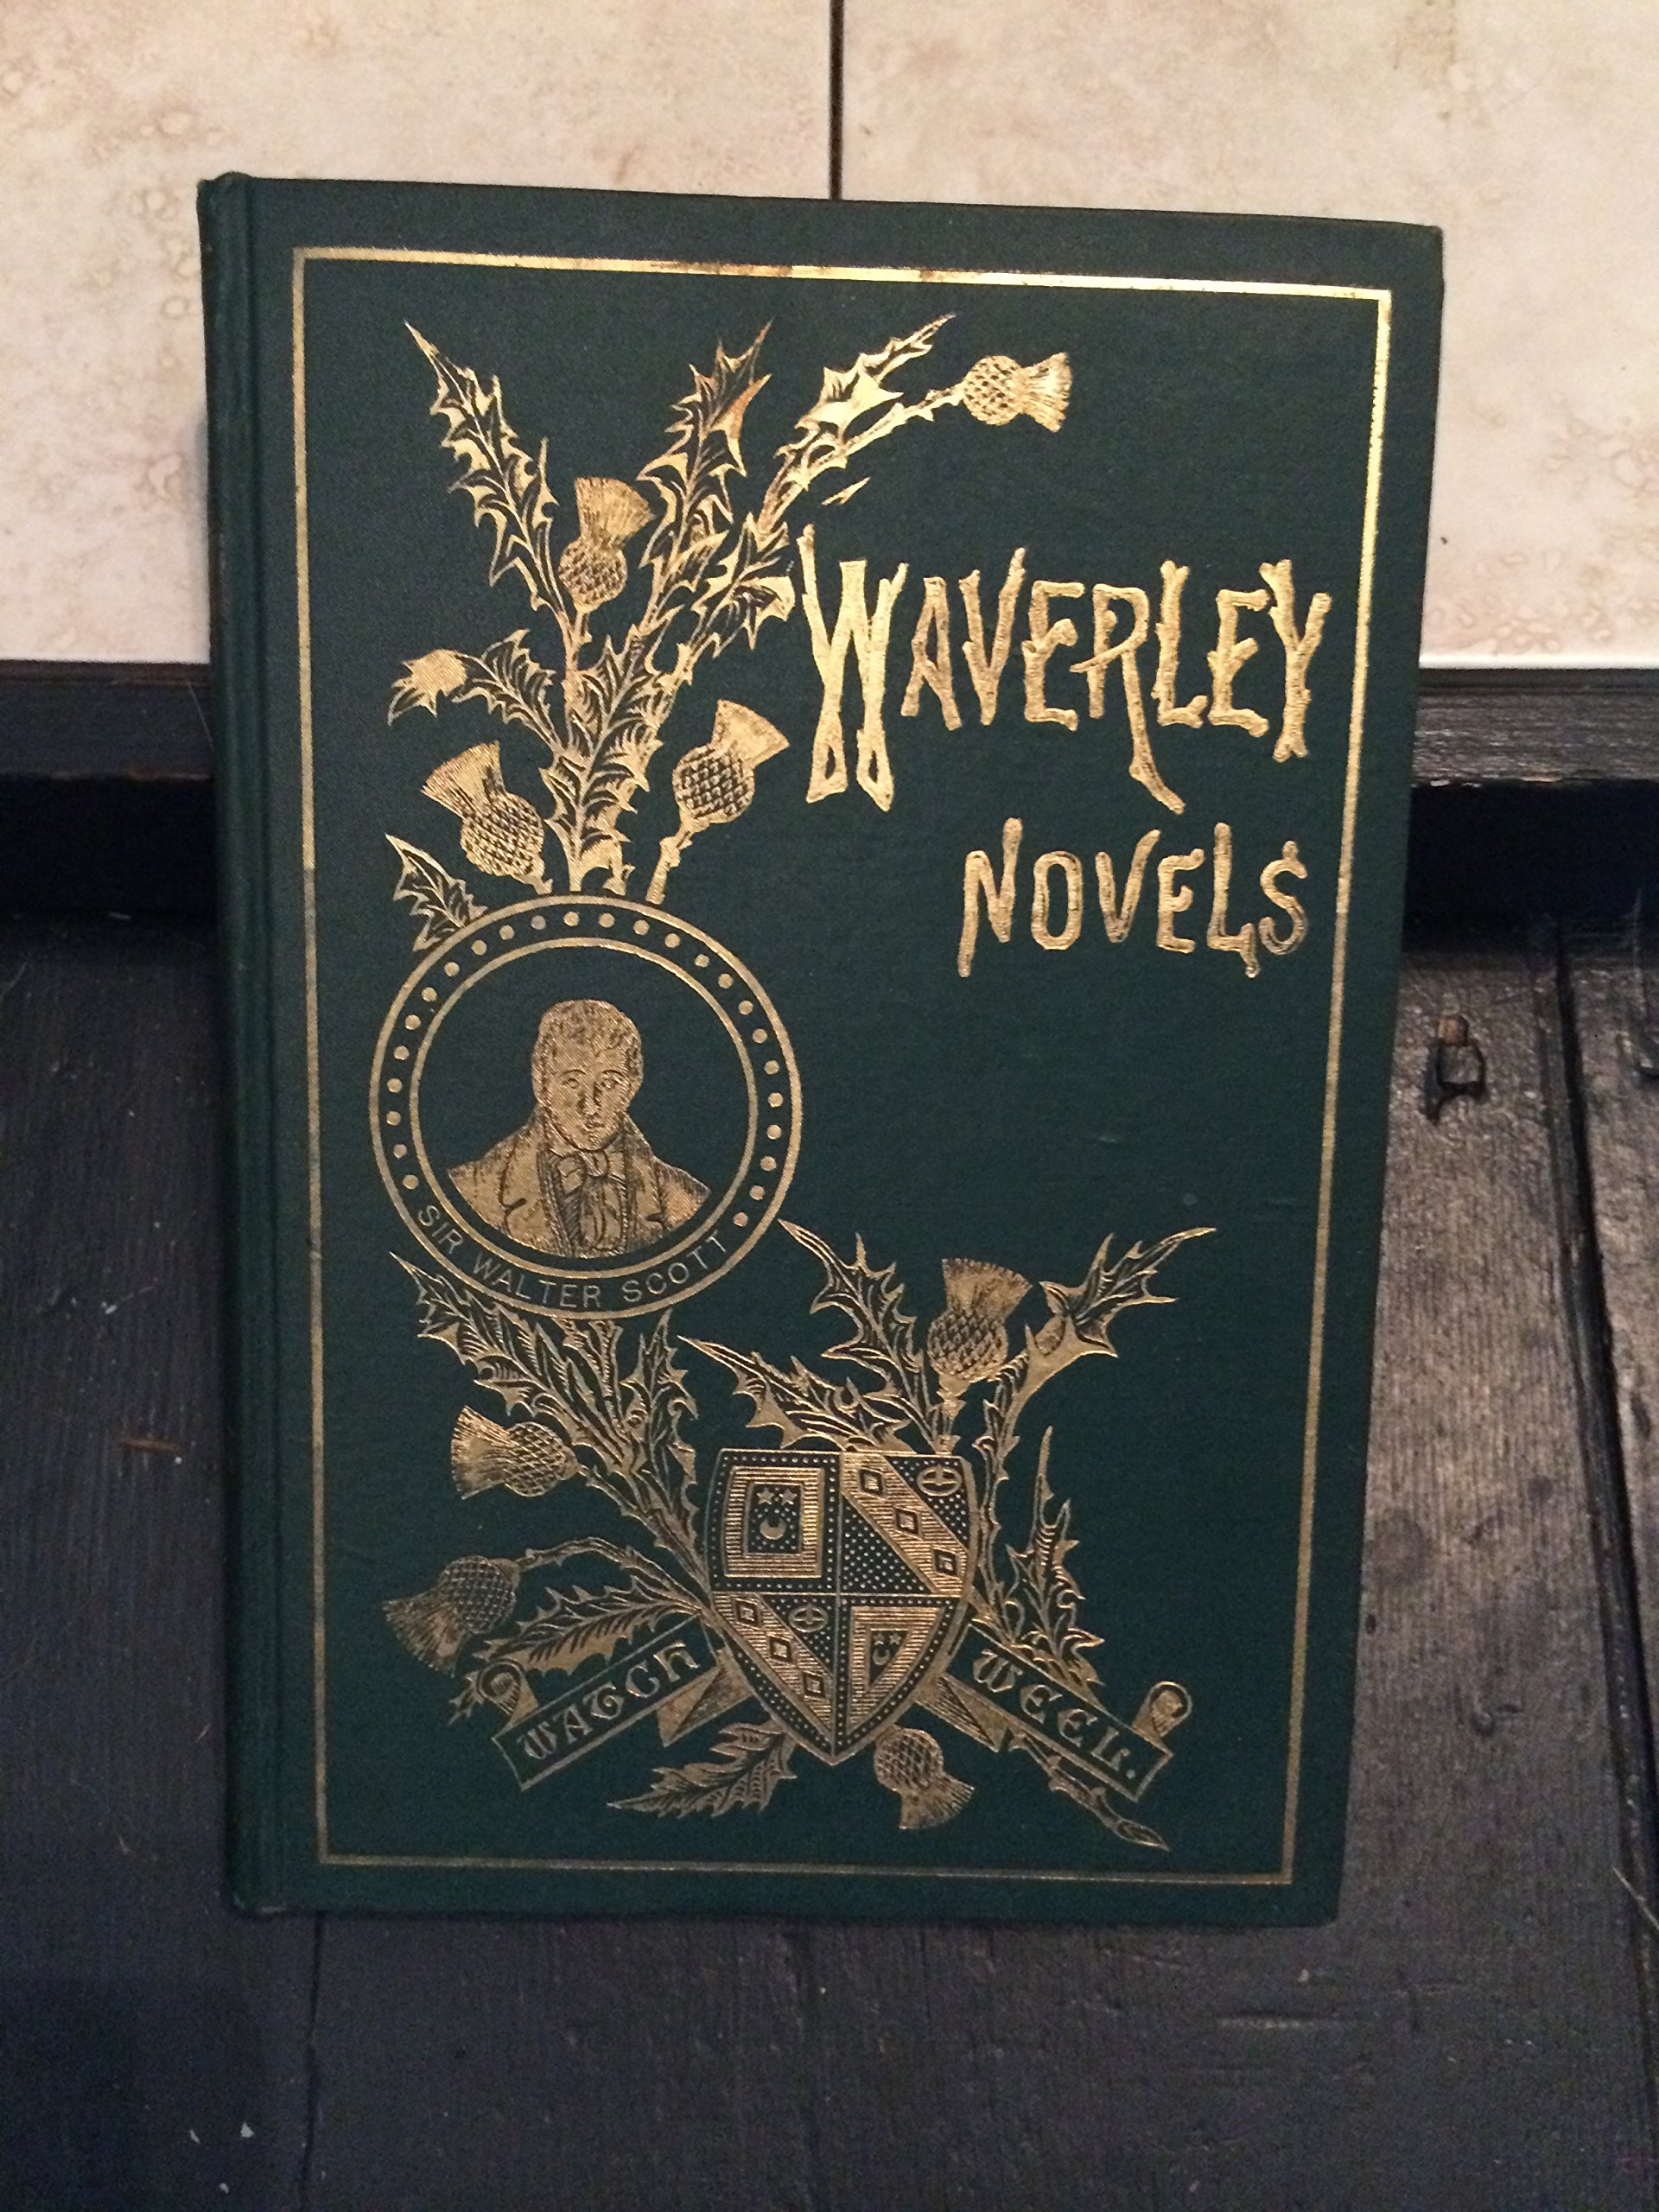 Waverley Novels Collier Waverley Novels Volume iv